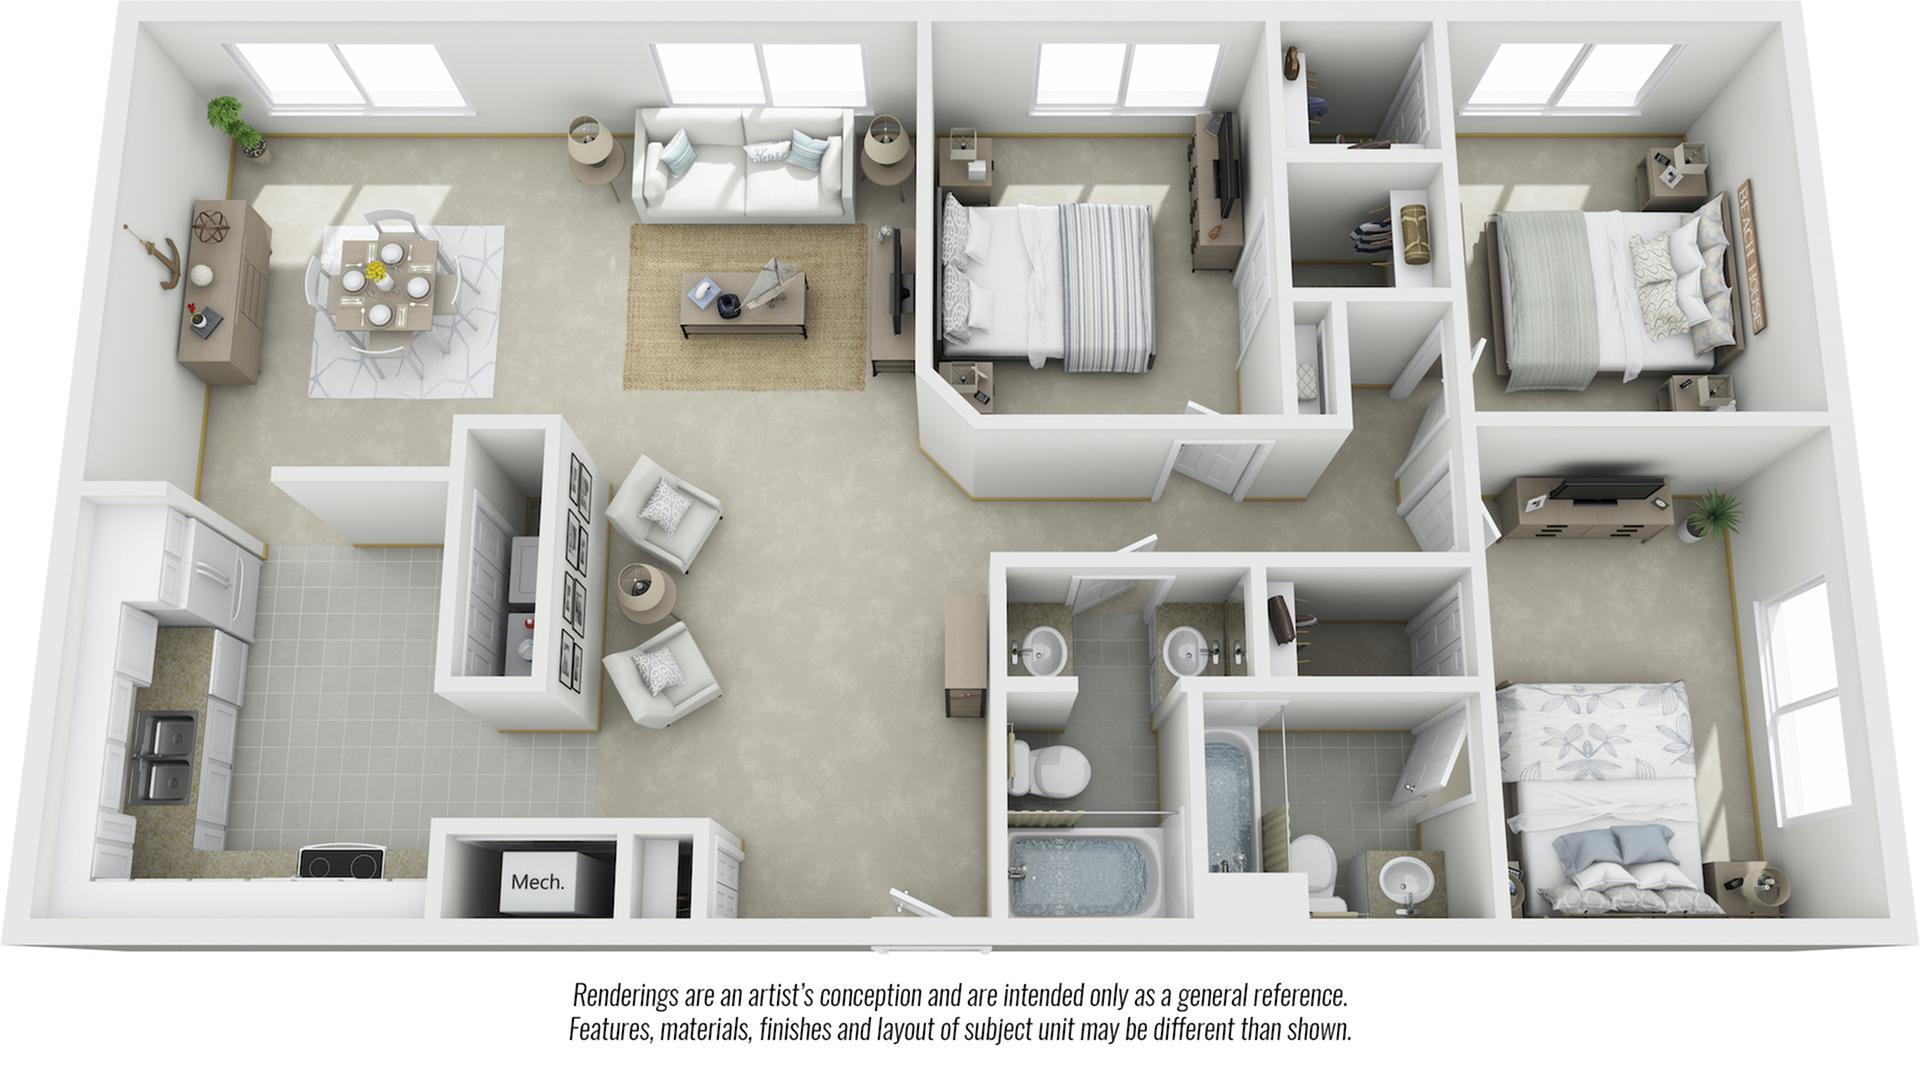 Sequoia 3 bedrooms 2 bathrooms floor plan with premium finishes